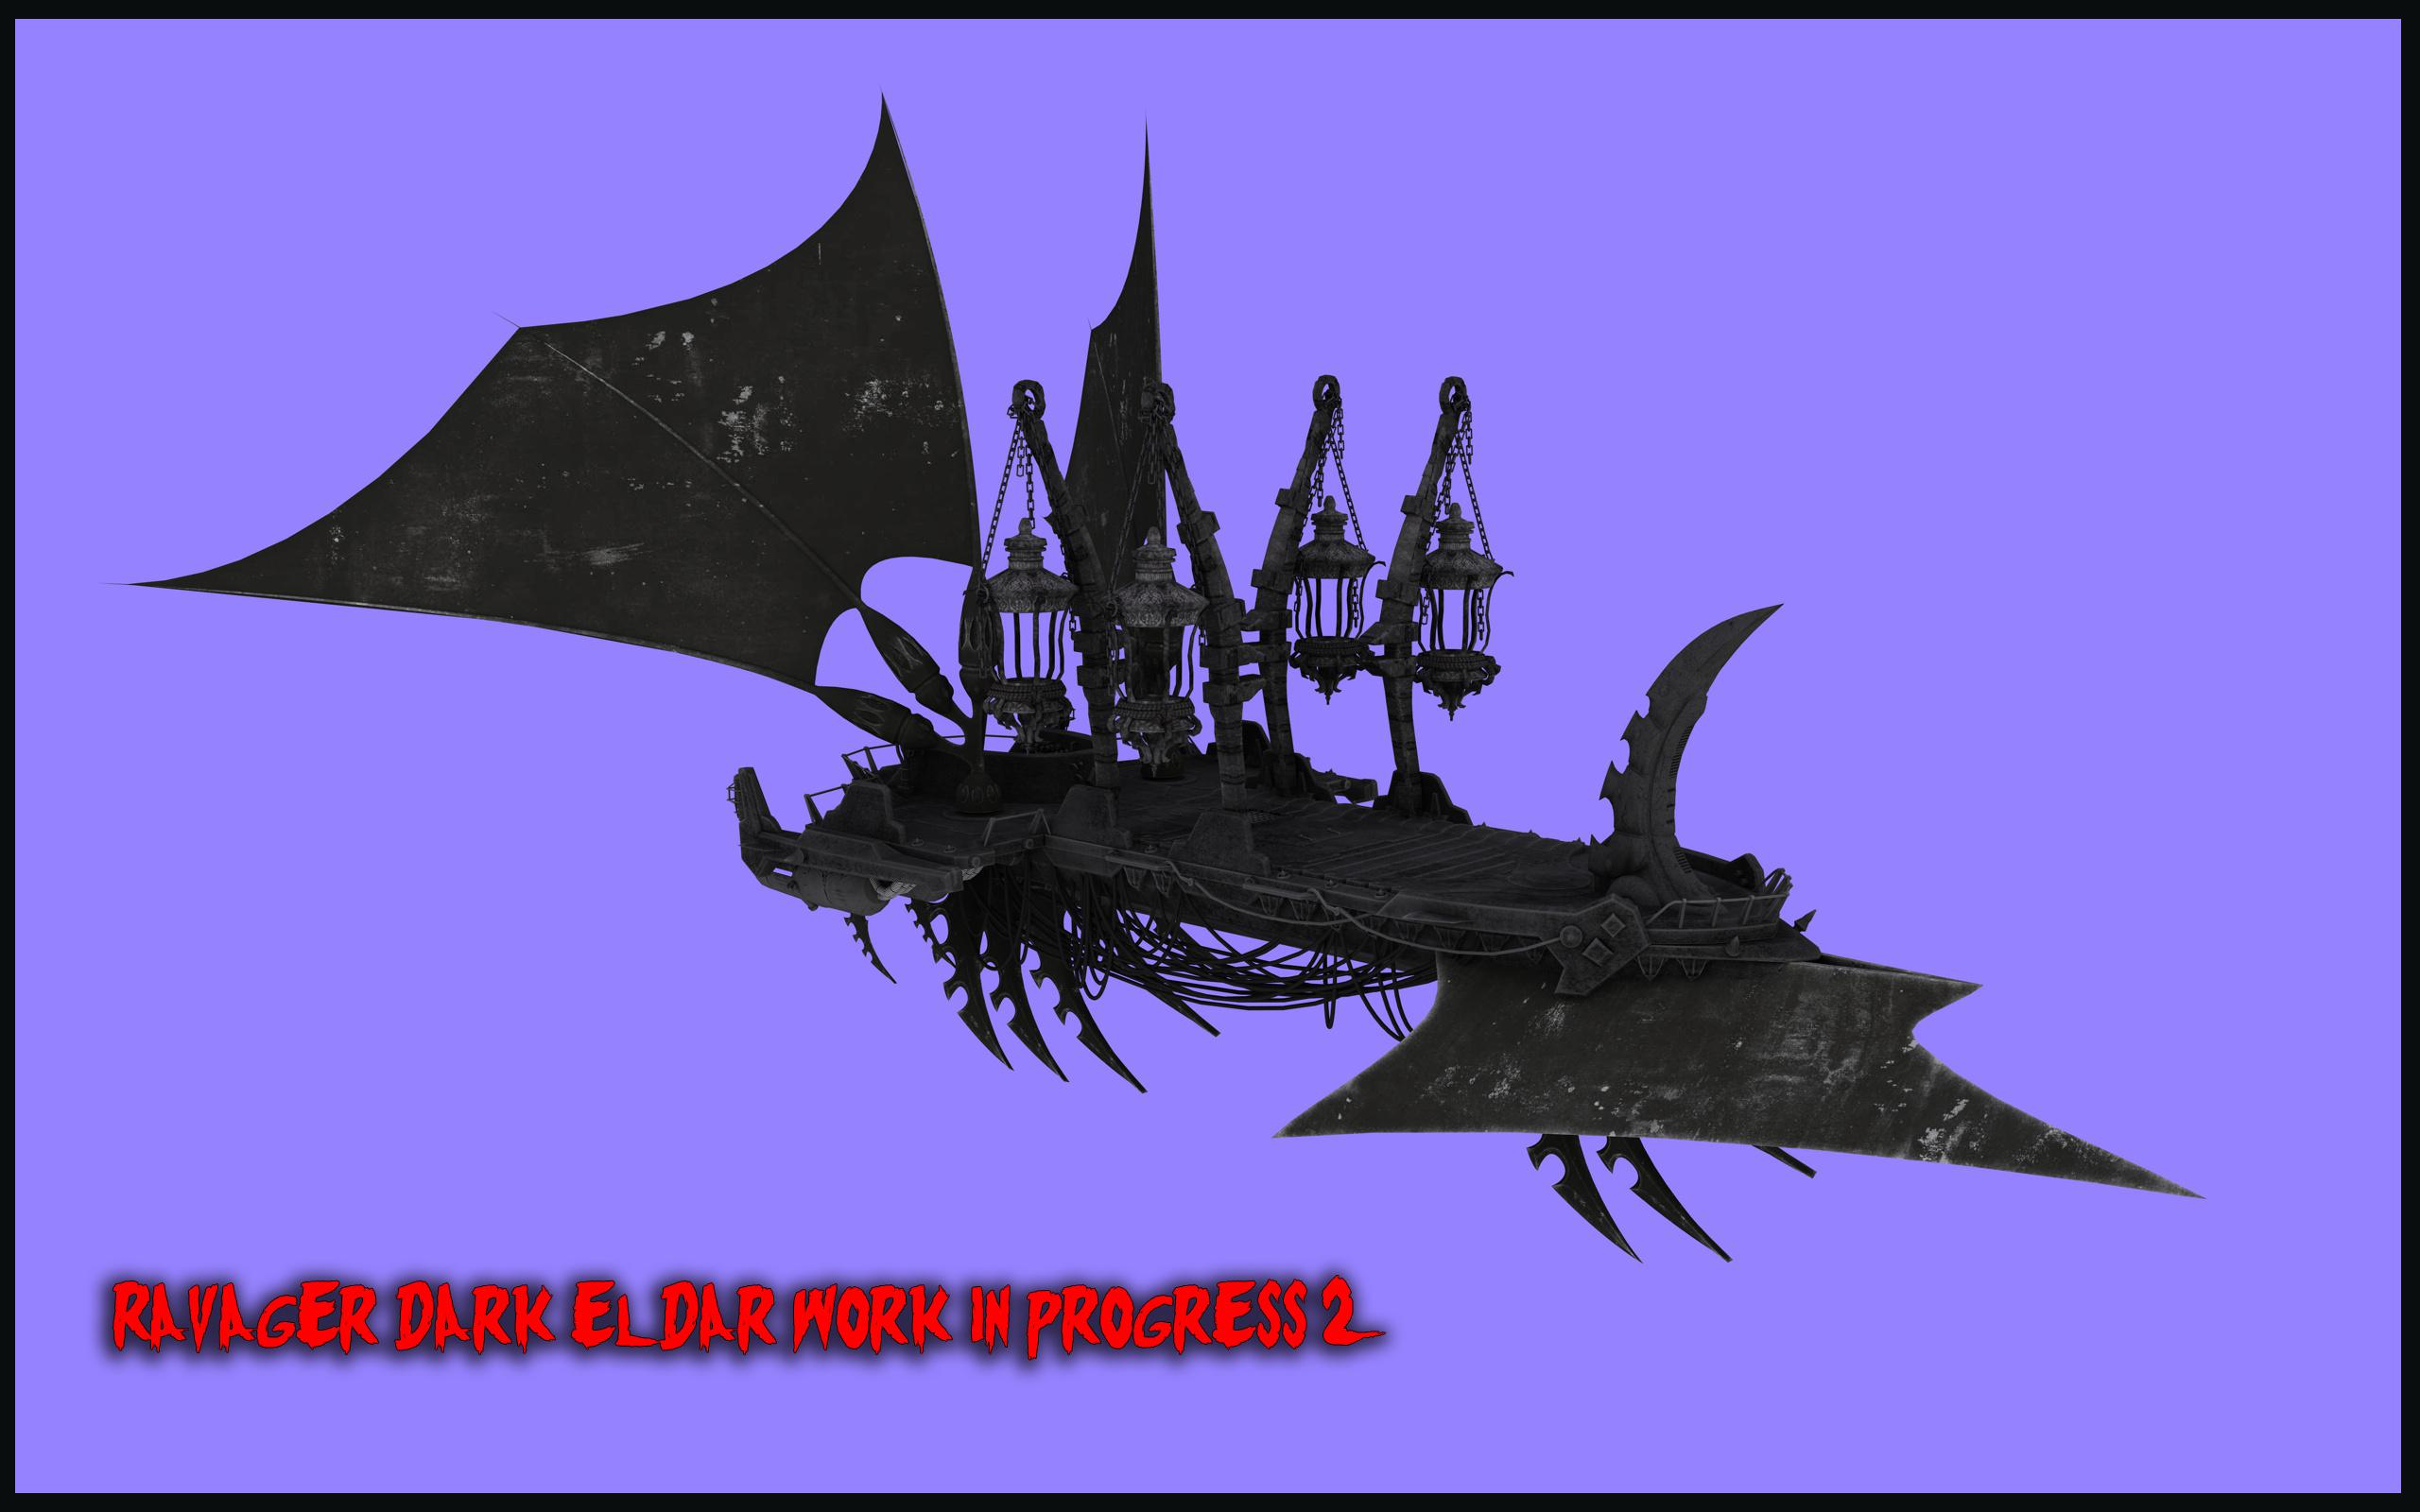 ravager dark eldar work in progress 2 by jibicoco